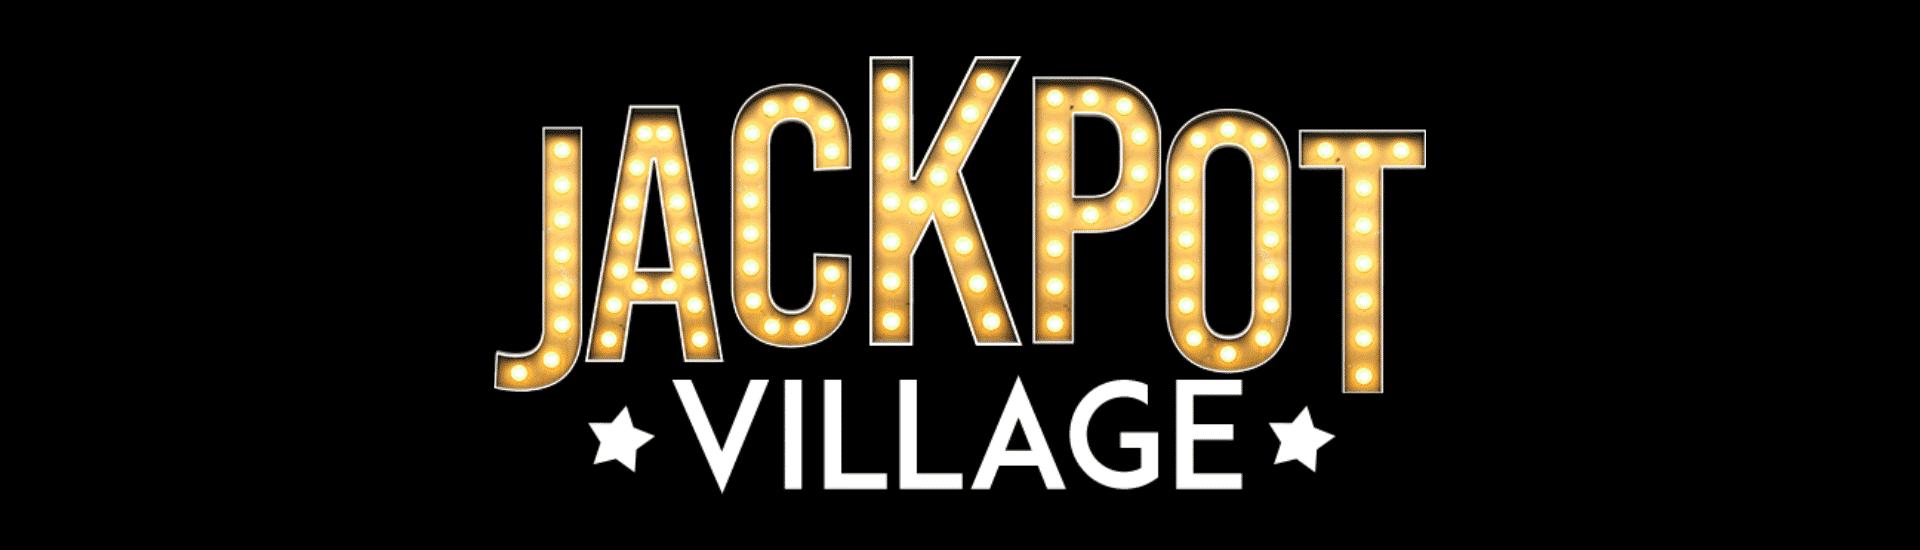 Jackpot Village Featured Image